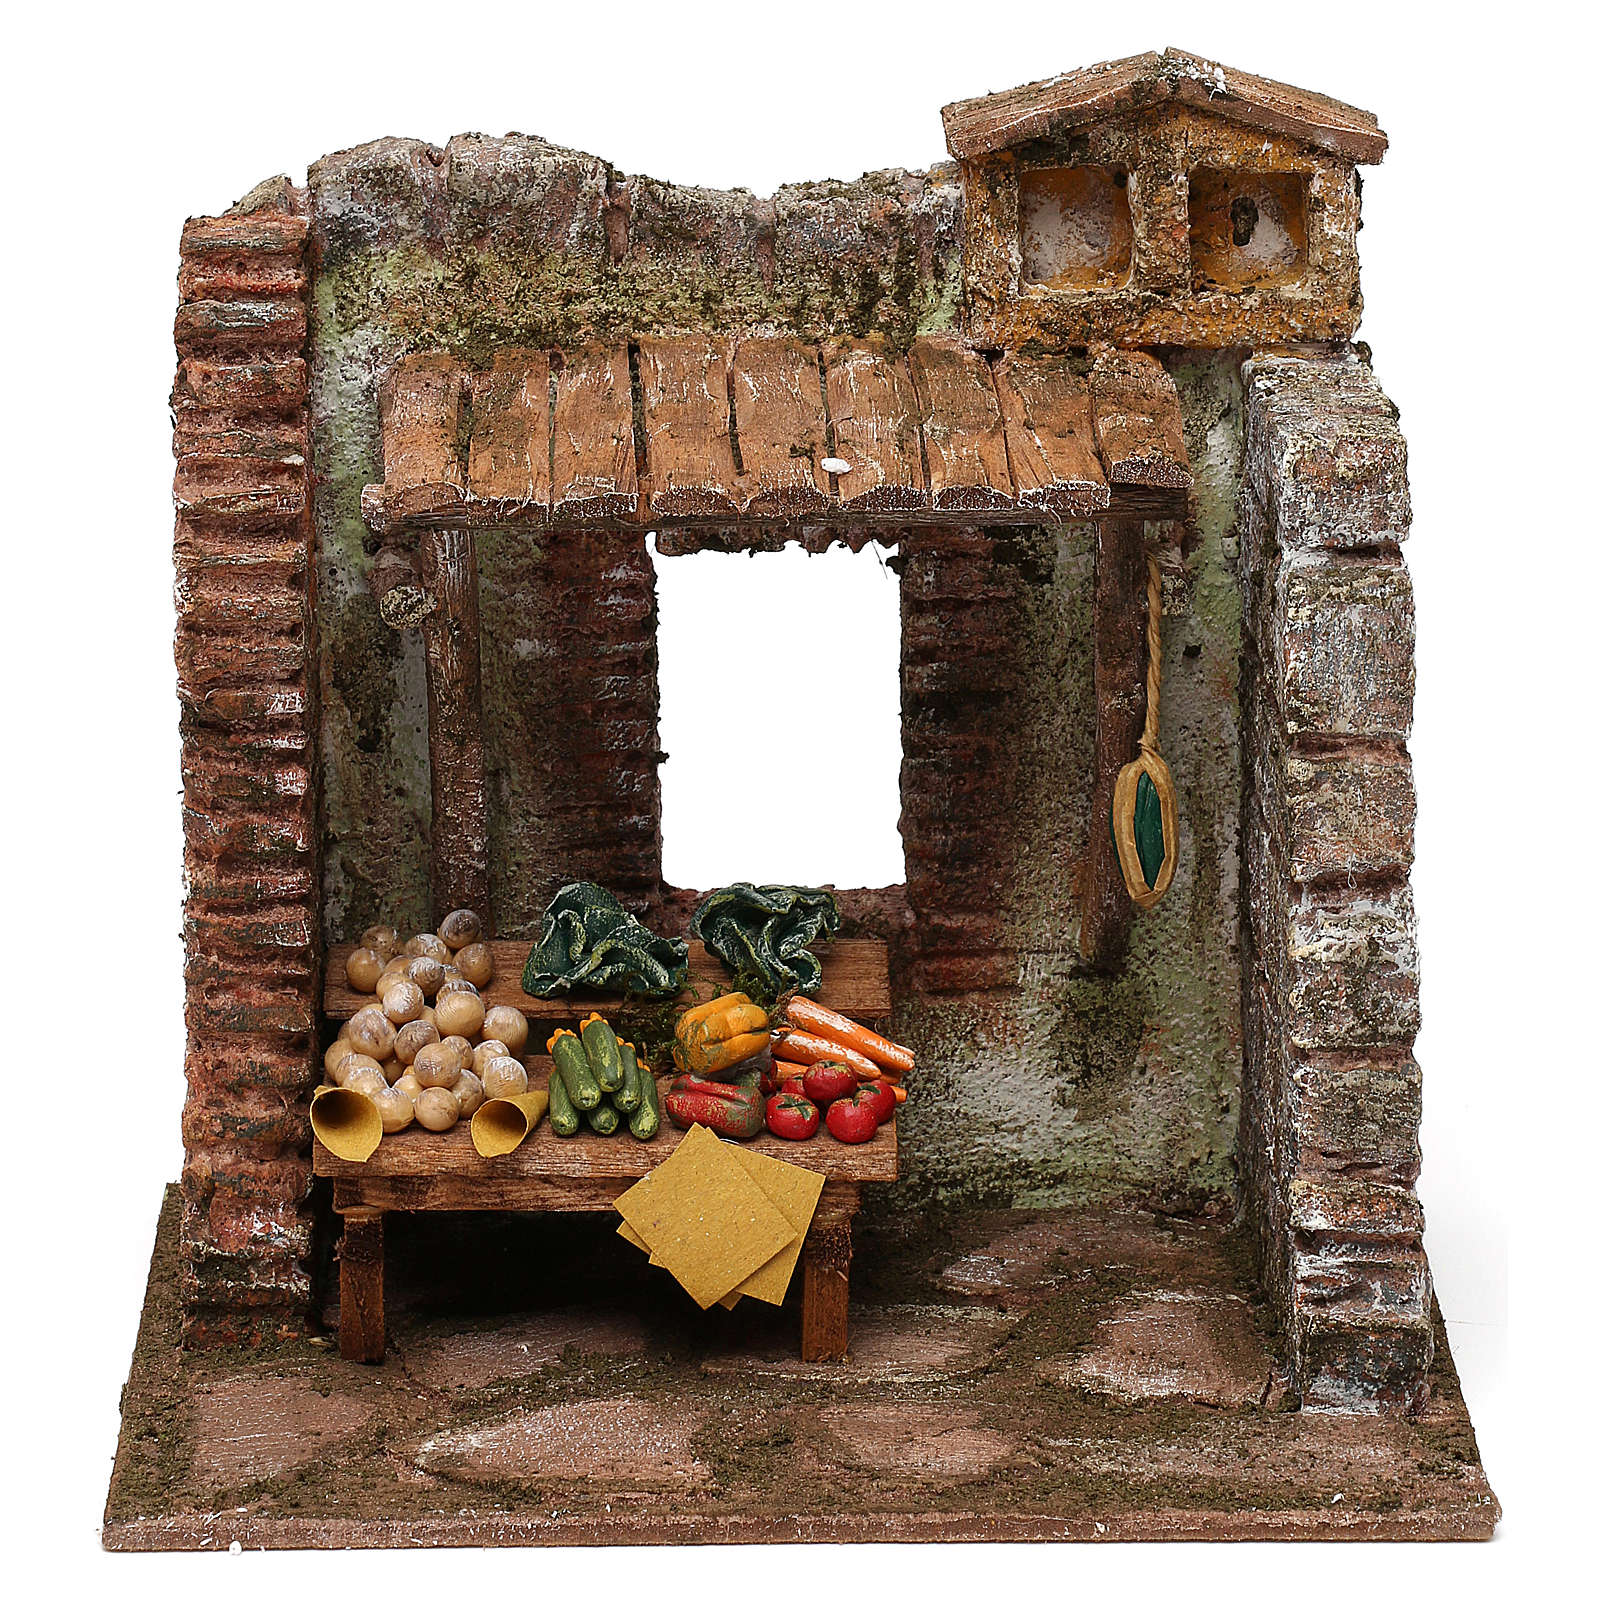 Greengrocer setting for 10 cm Nativity scene, 20x20x15 cm 4